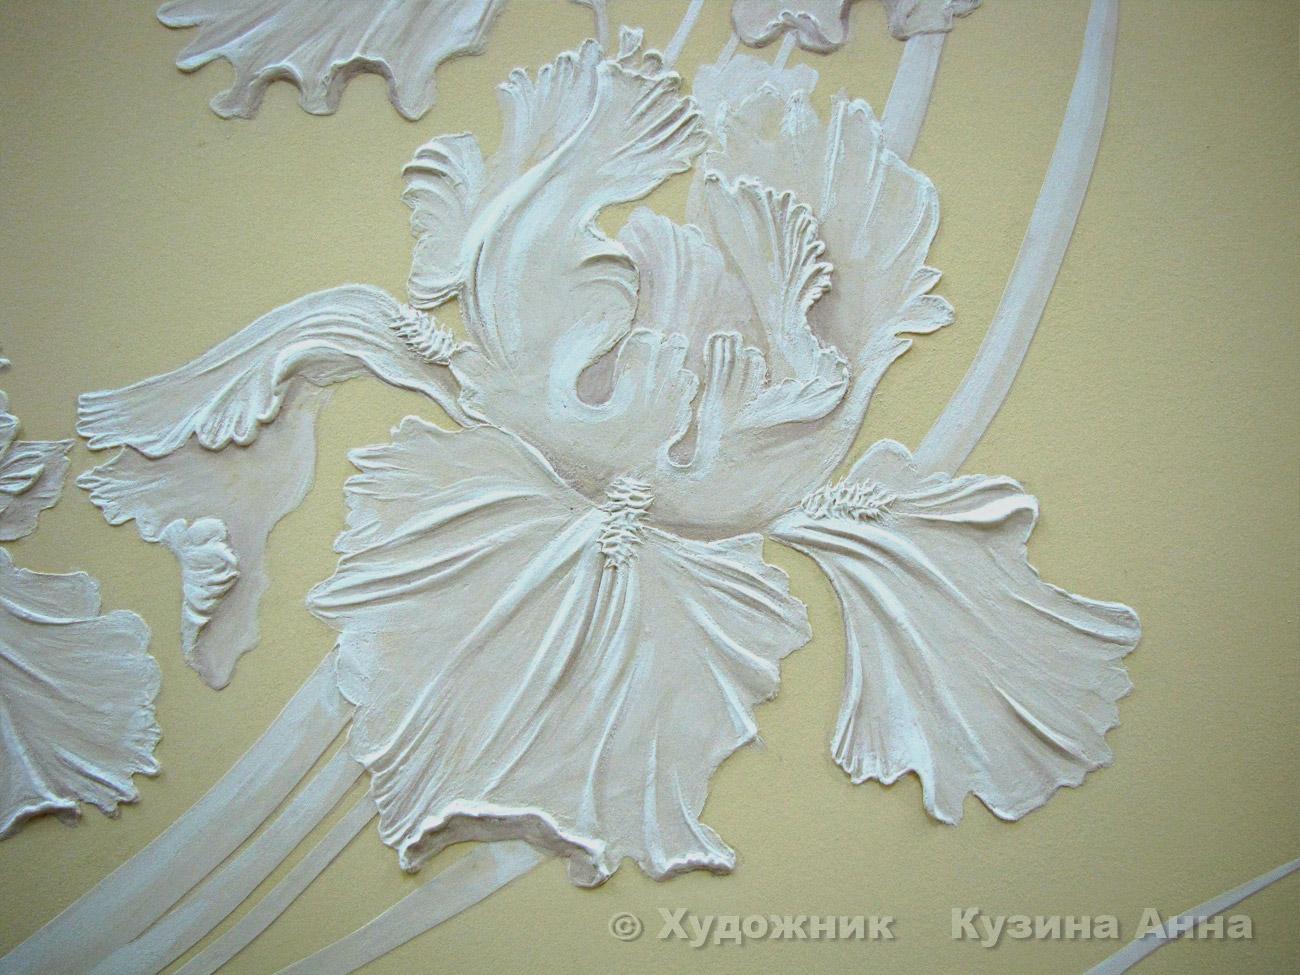 Барельеф цветка на стене фото